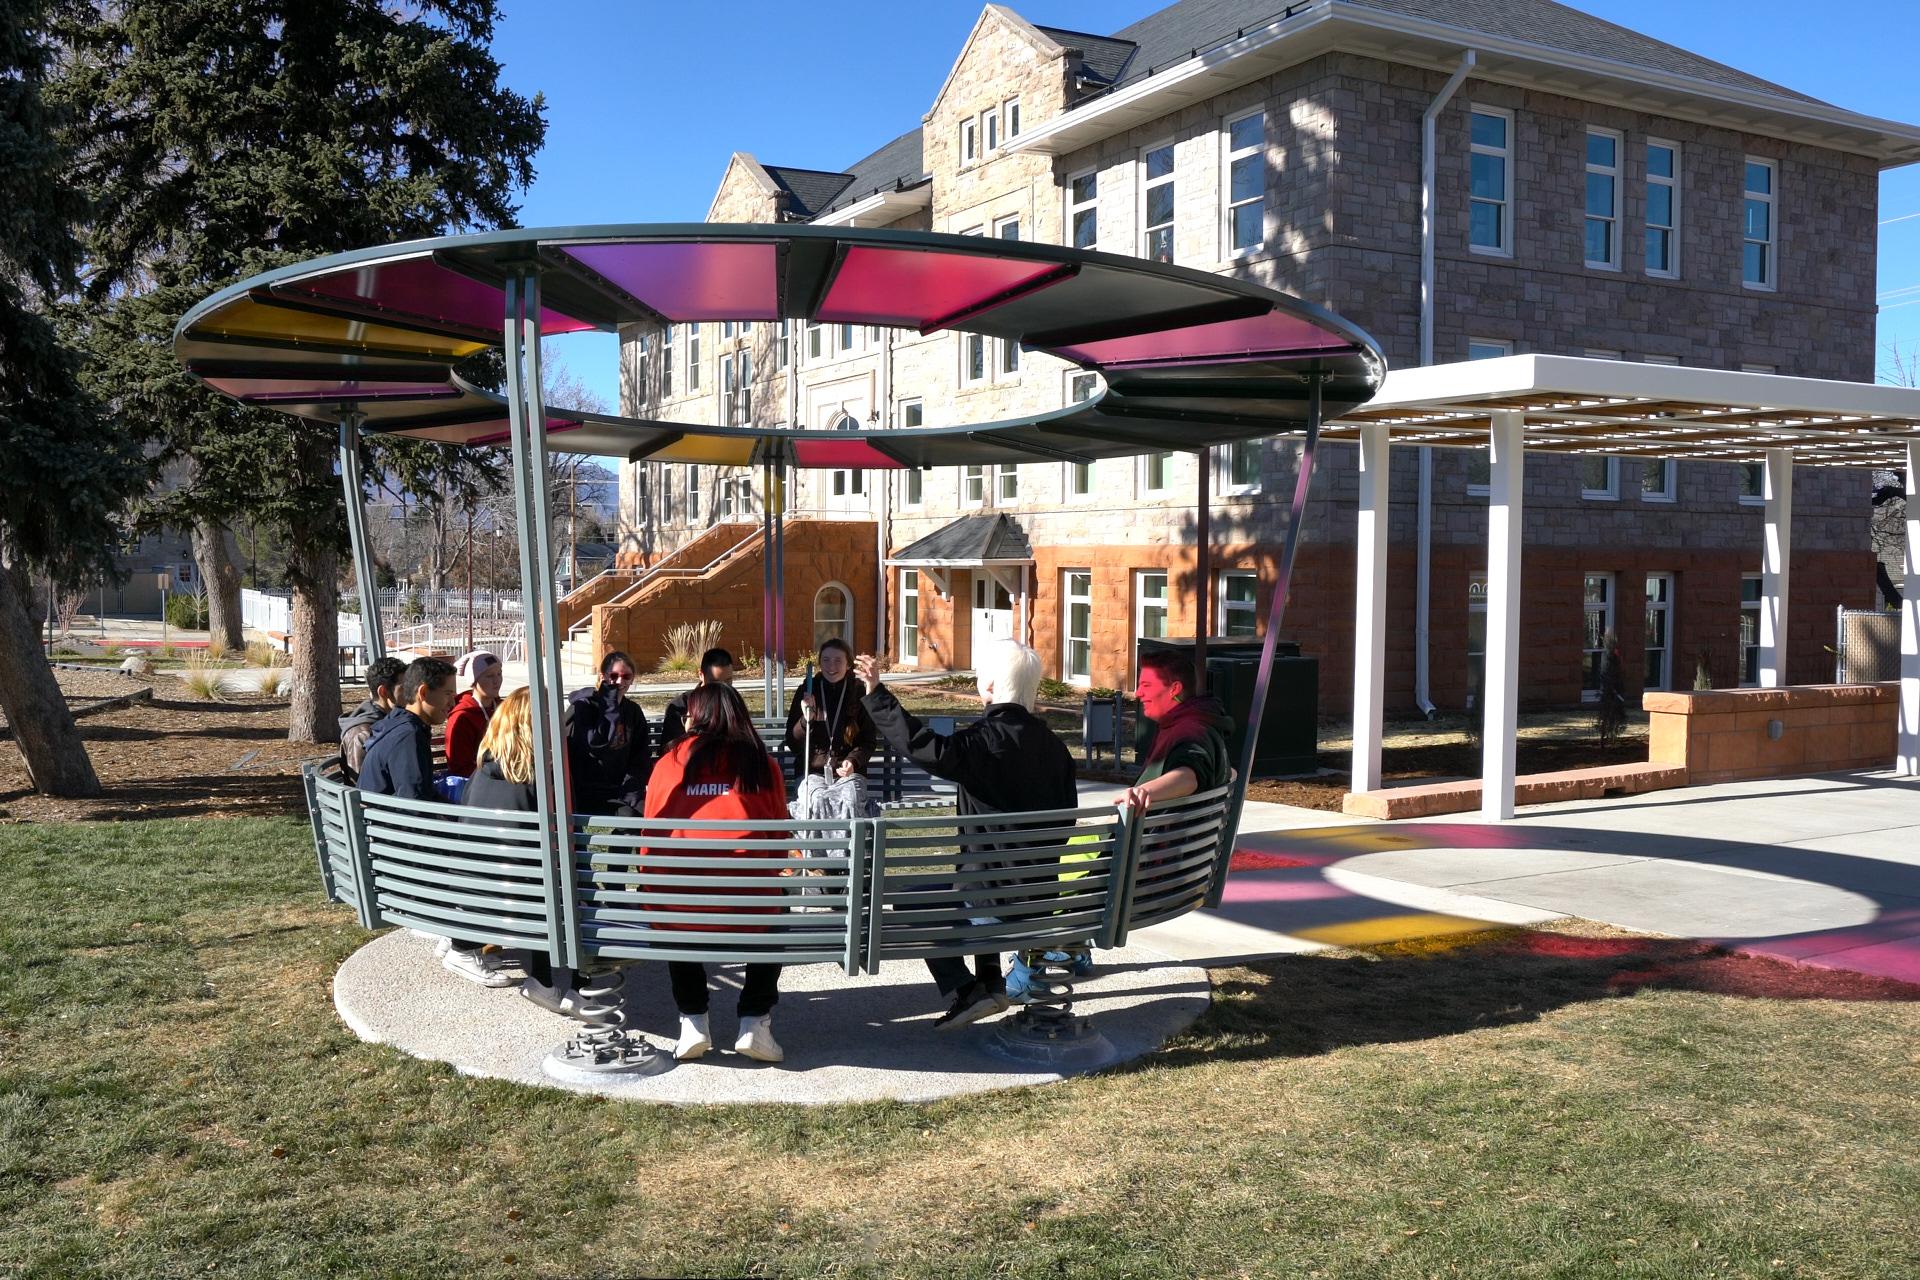 Matthew Geller_Springs_Colorado Springs_Public Art Services_J Grant Projects_31.jpg